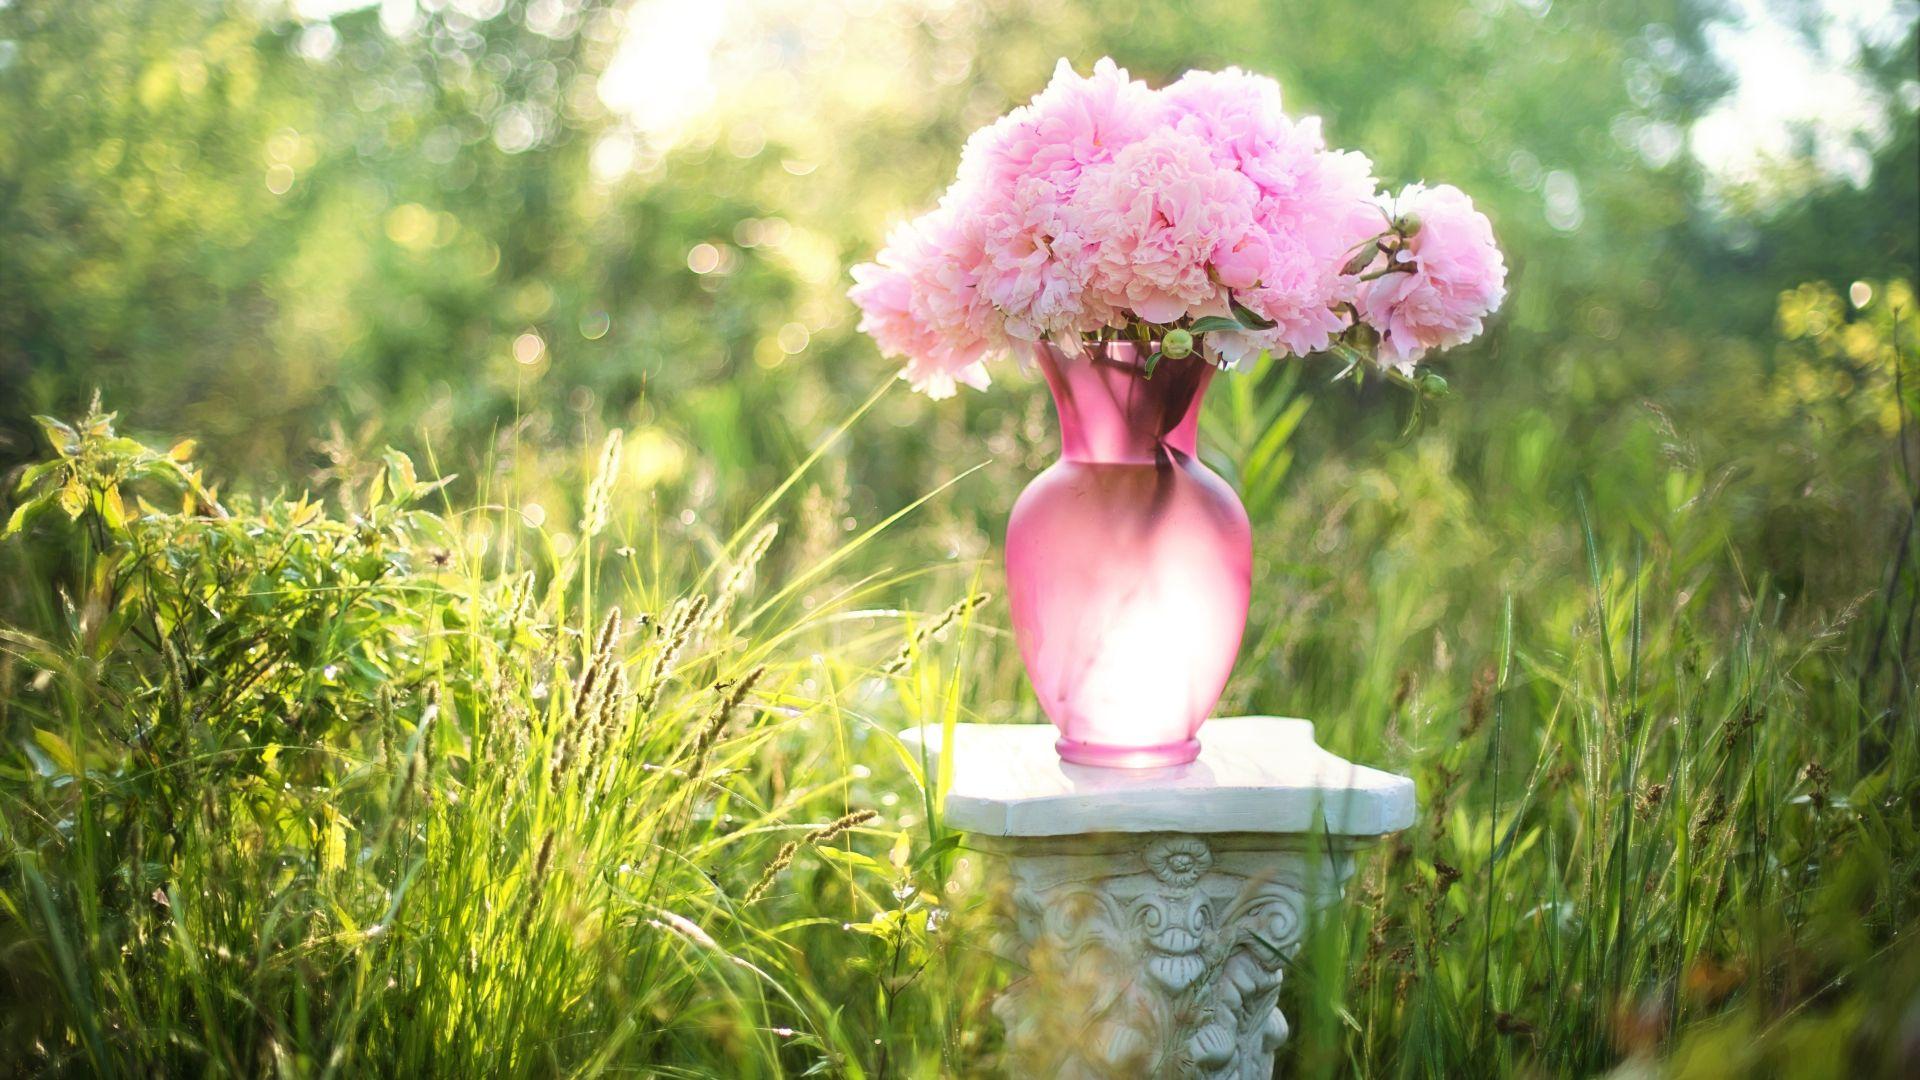 Flowers, bouquet, vase, pink flowers, grass